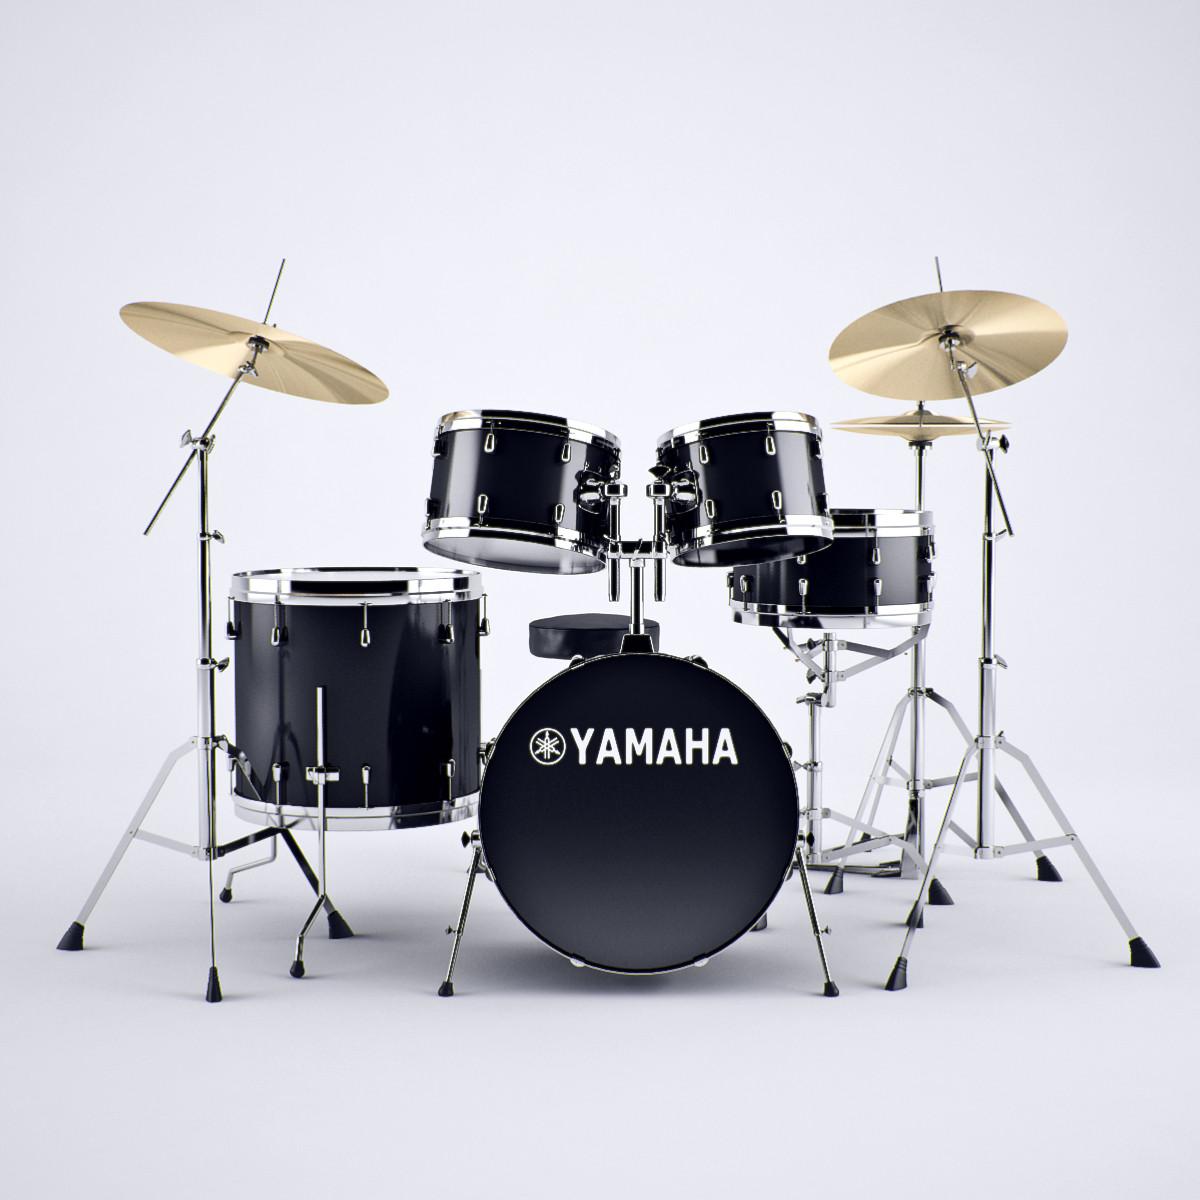 3d model yamaha drums set for Yamaha portable drums